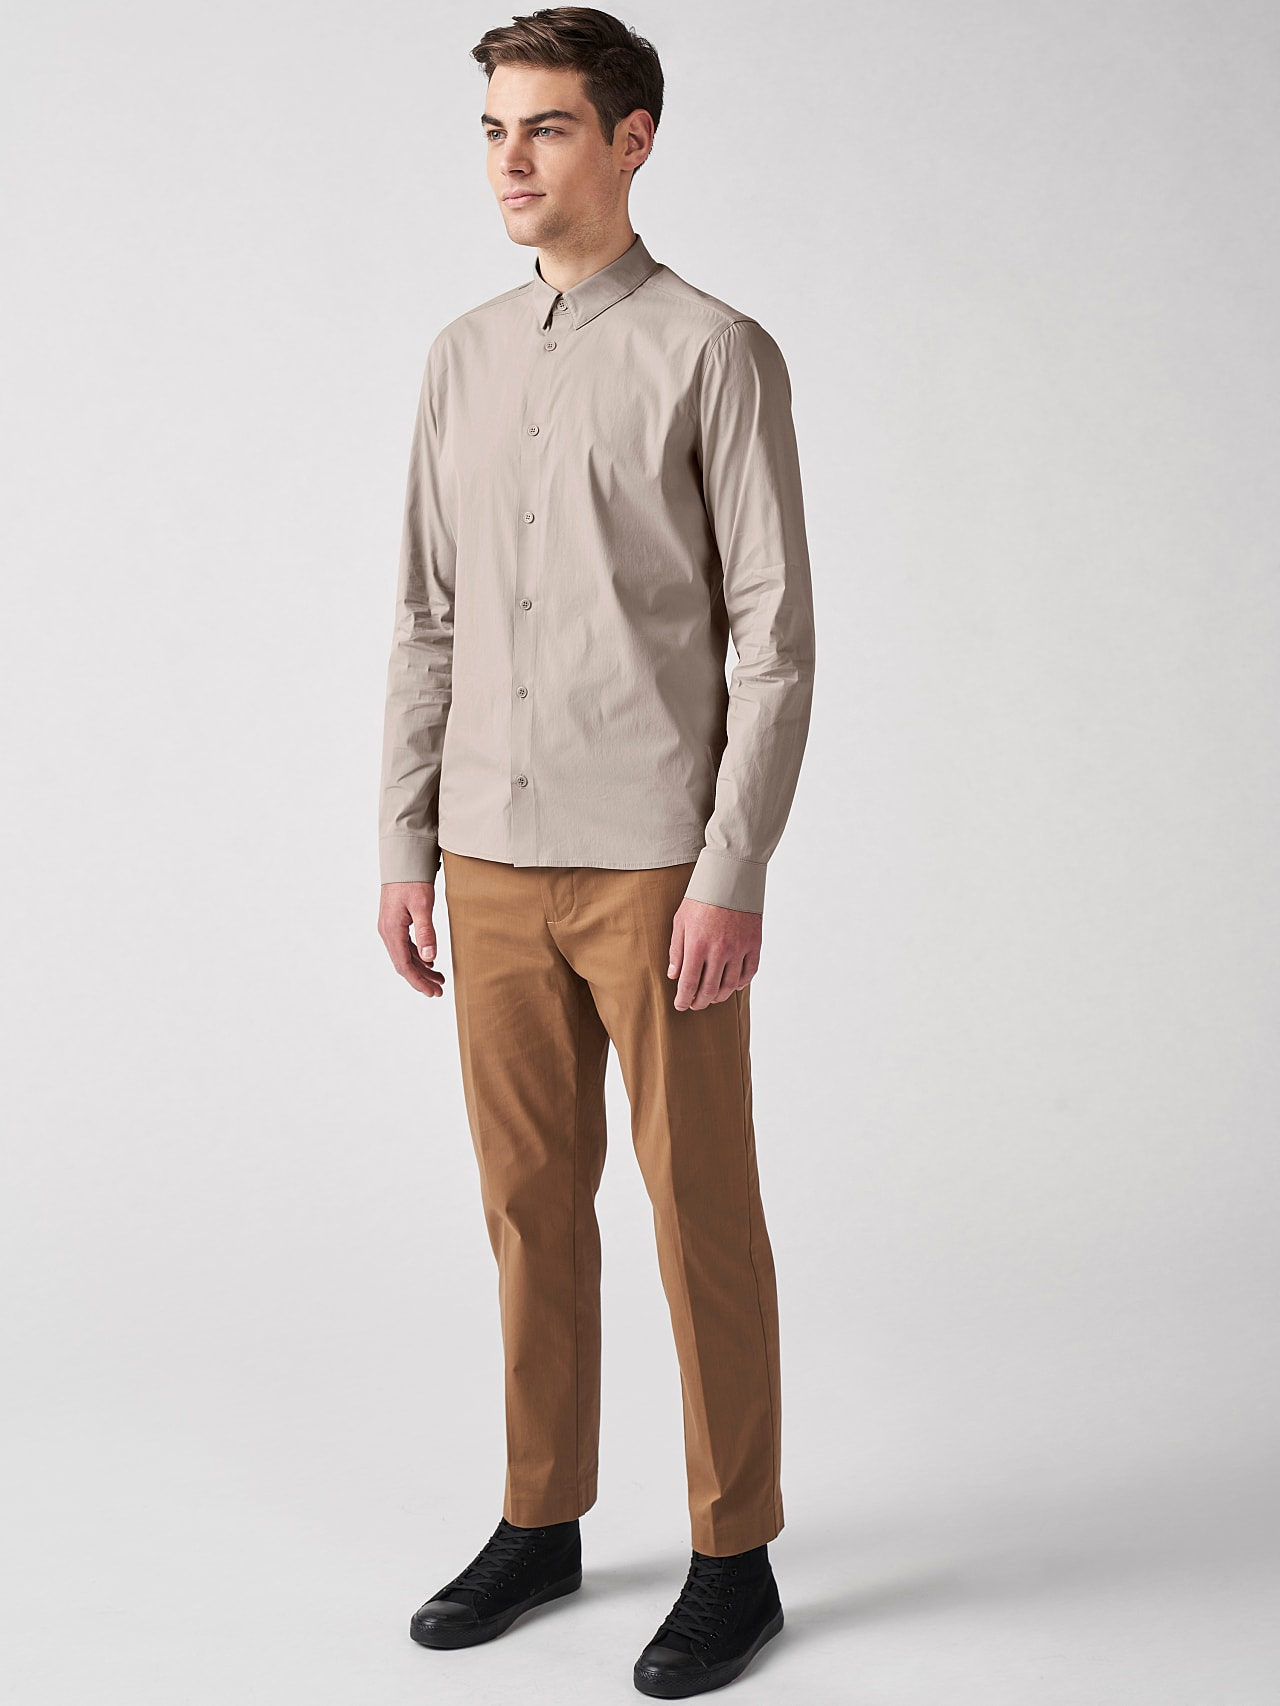 WAARG V1.Y5.01 Cotton-Stretch Shirt Sand Front Alpha Tauri